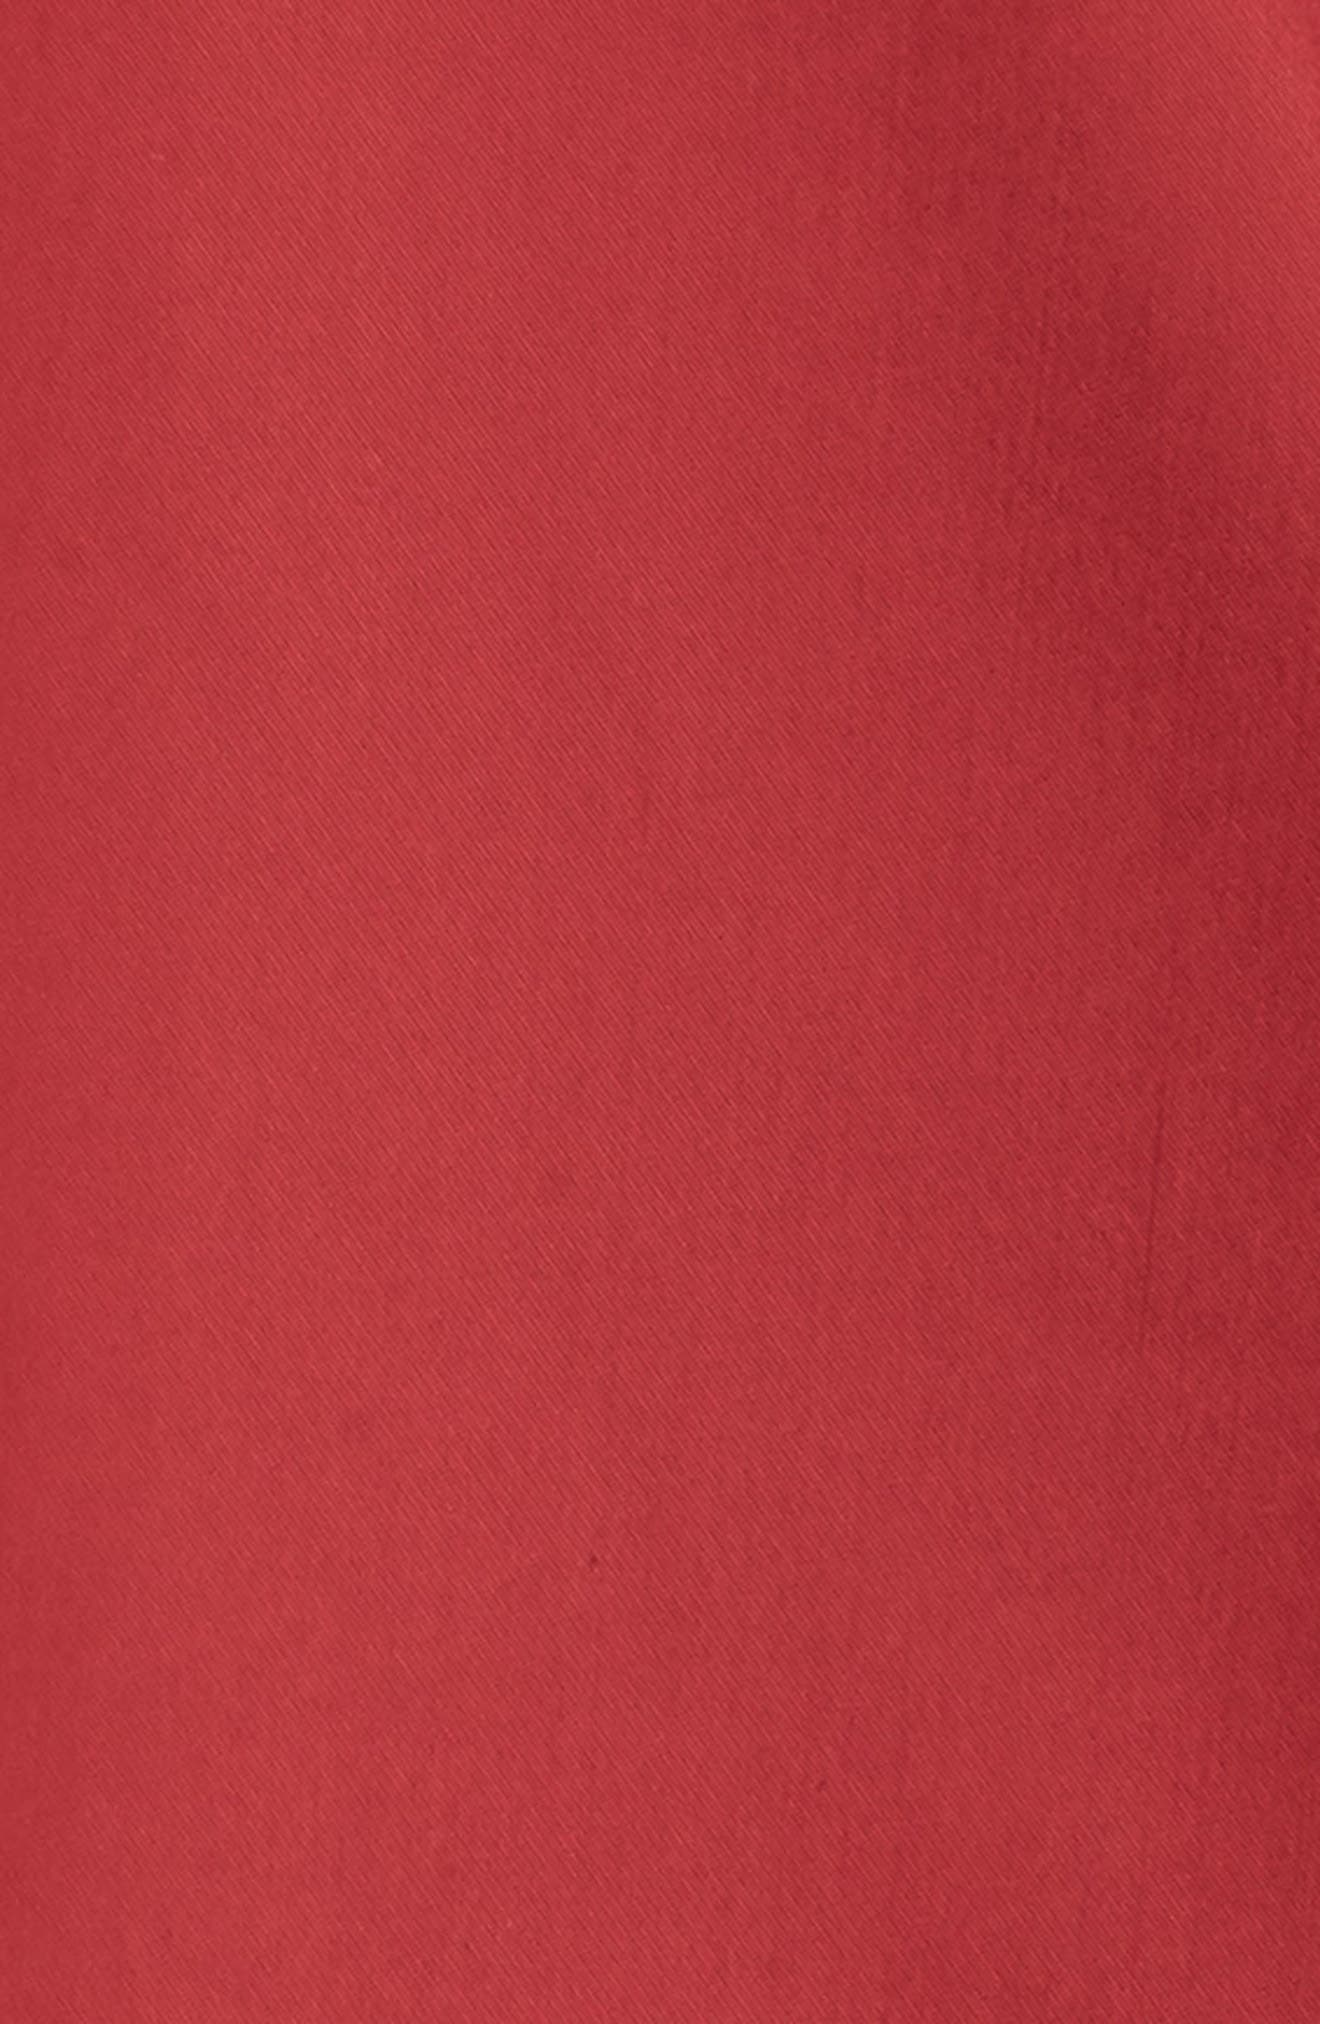 Flare Sleeve Packable Swing Jacket,                             Alternate thumbnail 5, color,                             Garnet